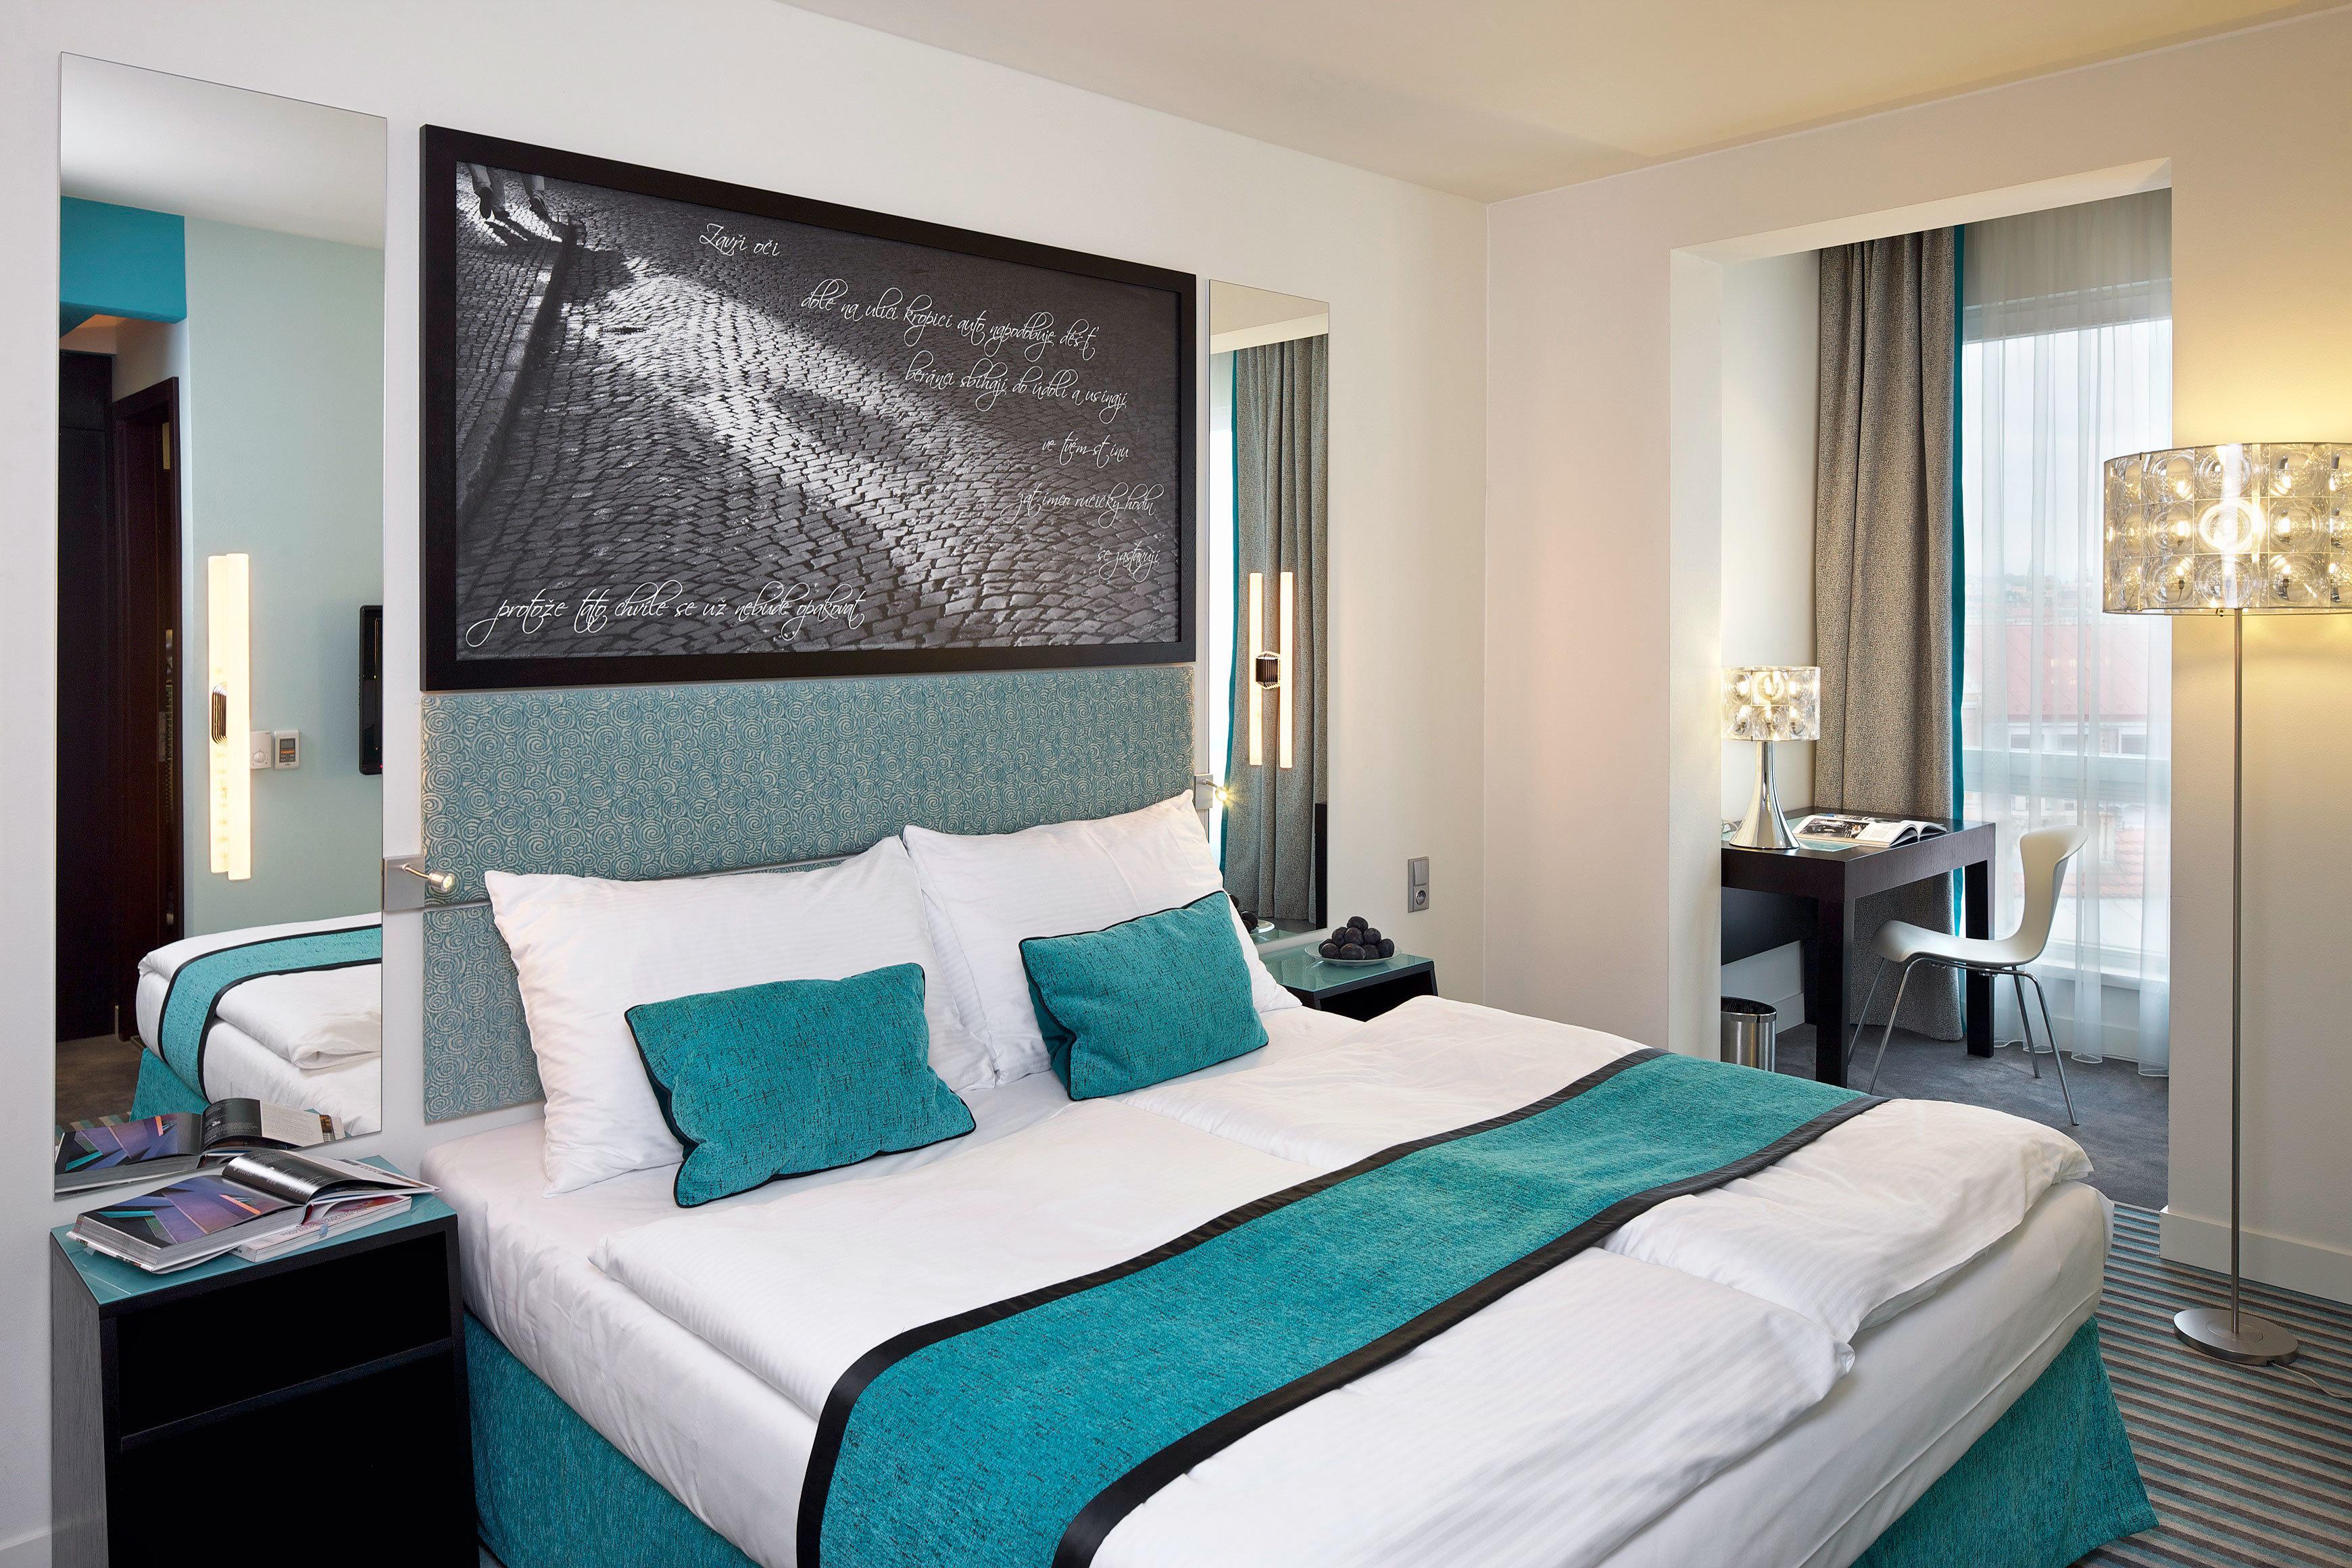 Bedroom Hip Luxury Suite property green scene pillow condominium bed sheet Modern painting